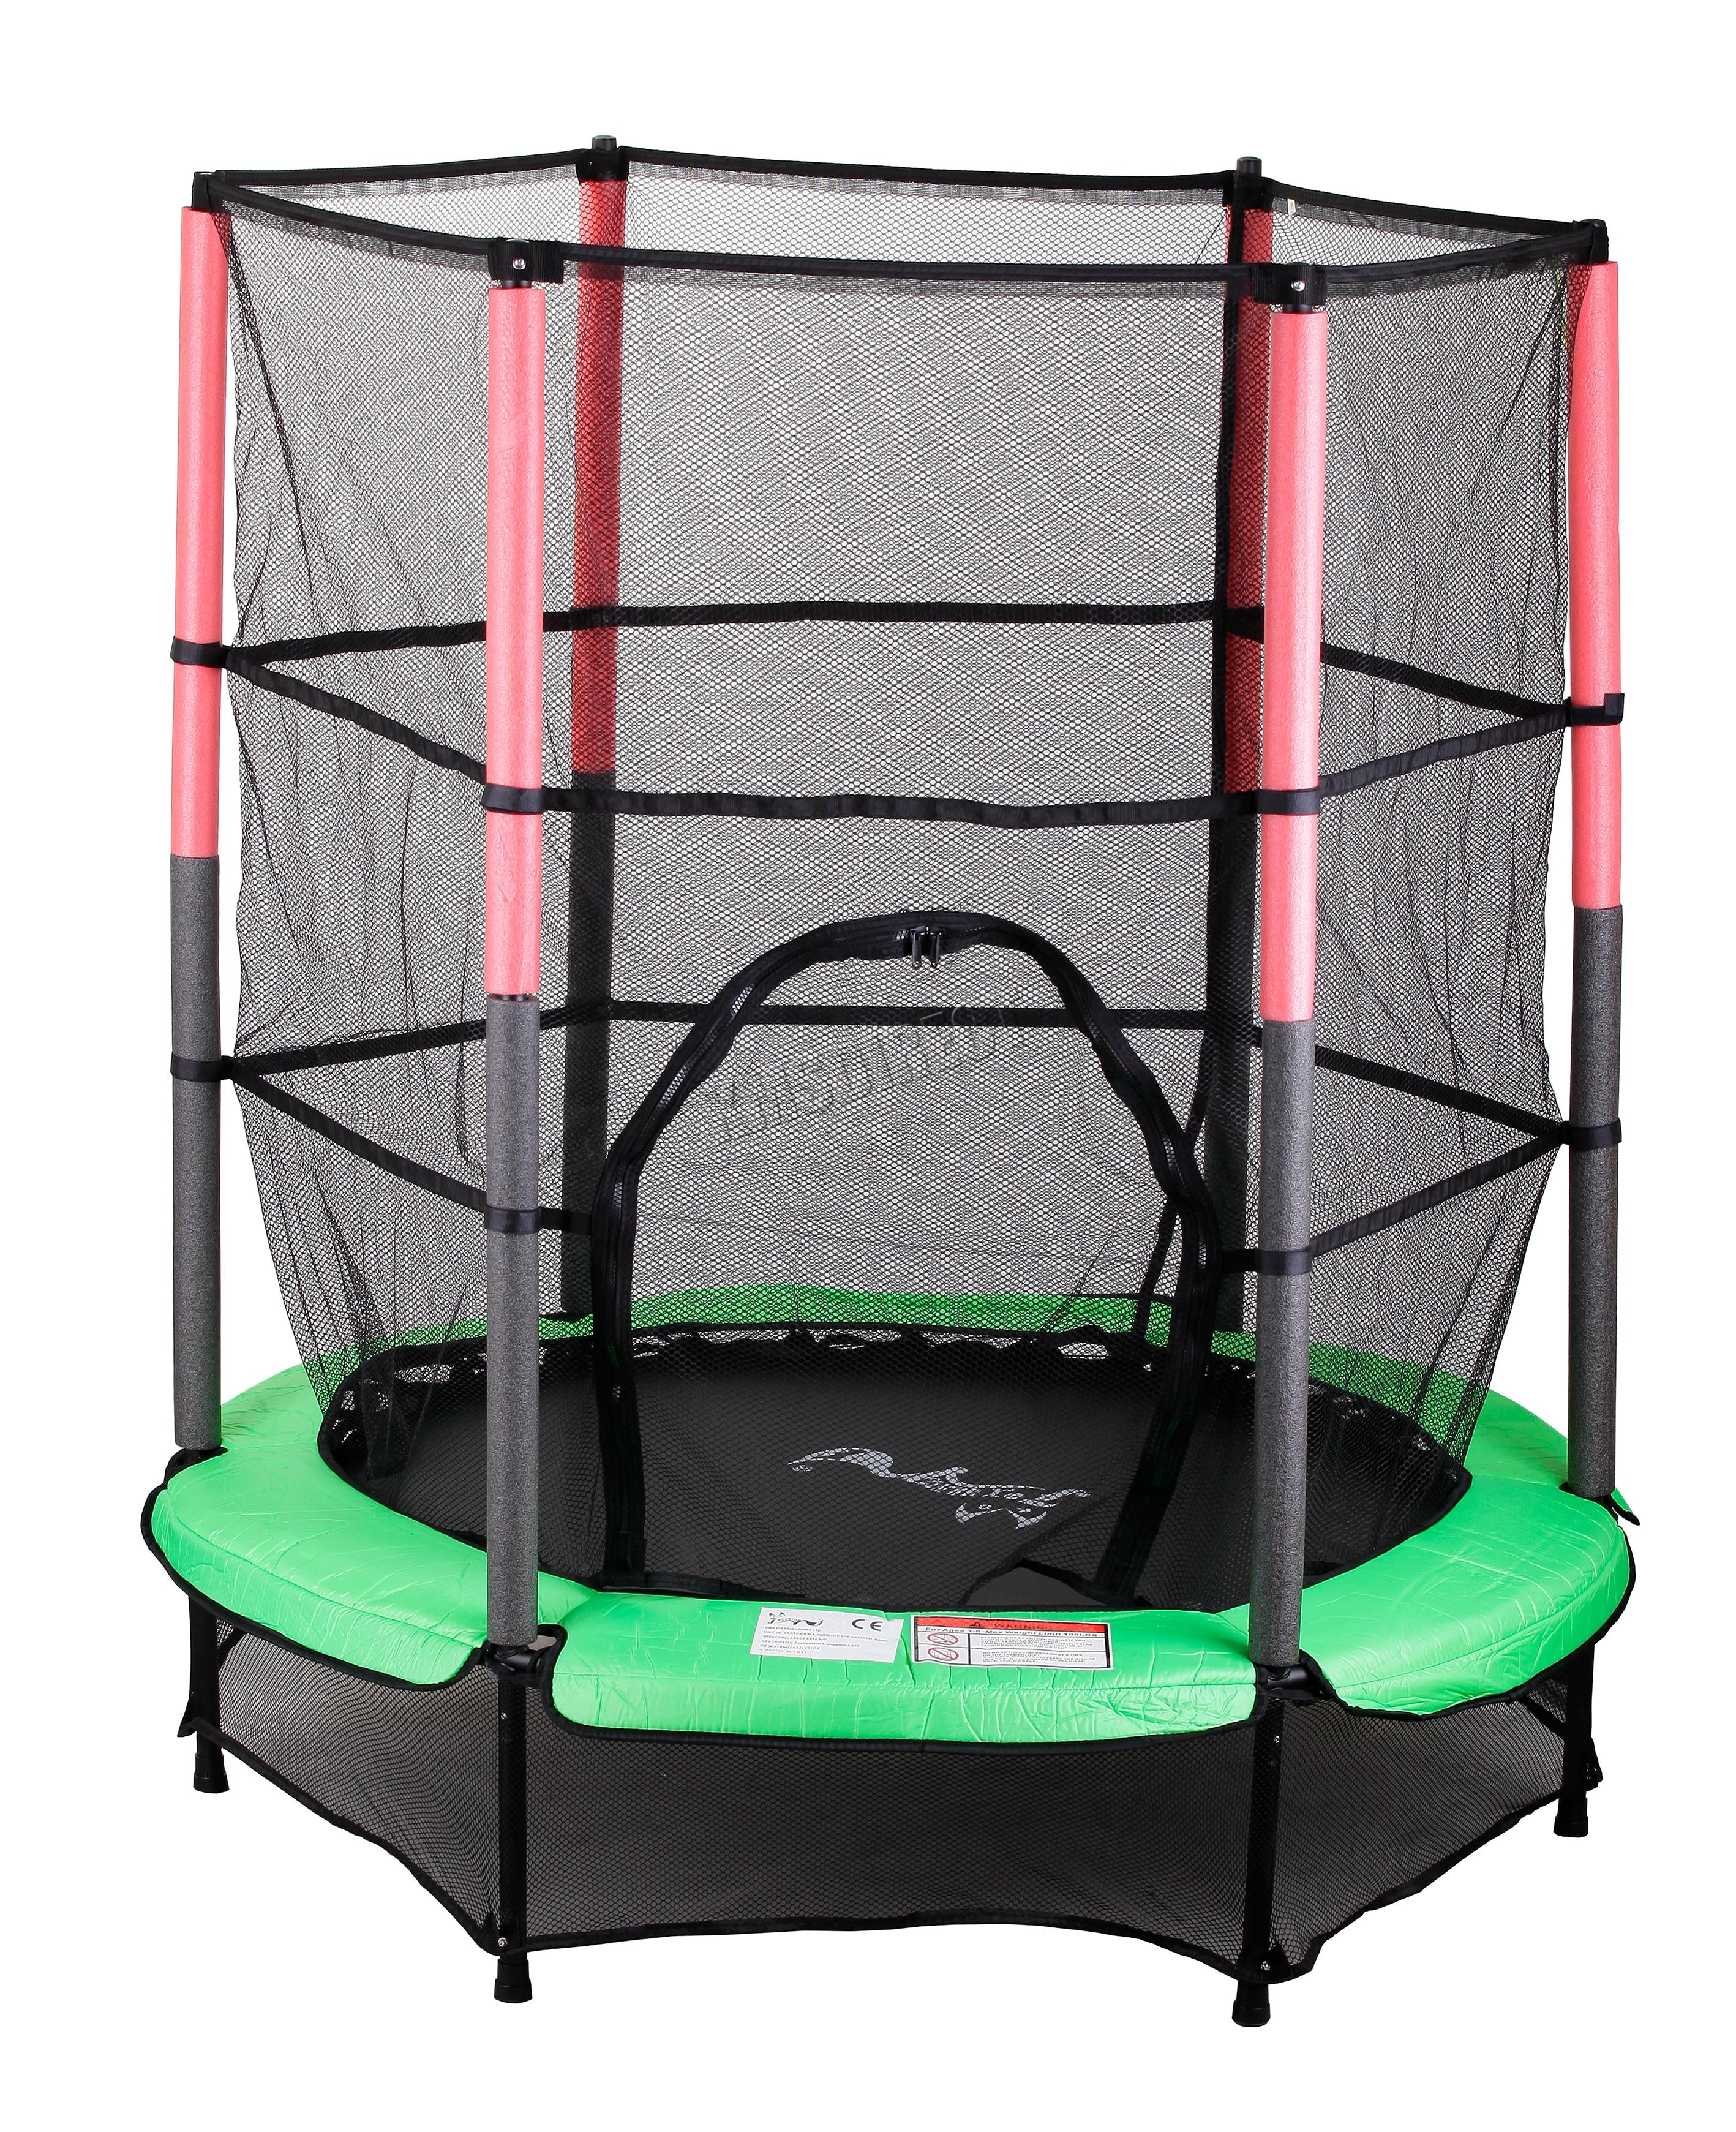 8ft Trampoline Safety Net Enclosure Ladder Rain Cover Shoe: Trampoline With Safety Enclosure Net Ladder Rain Cover 8FT